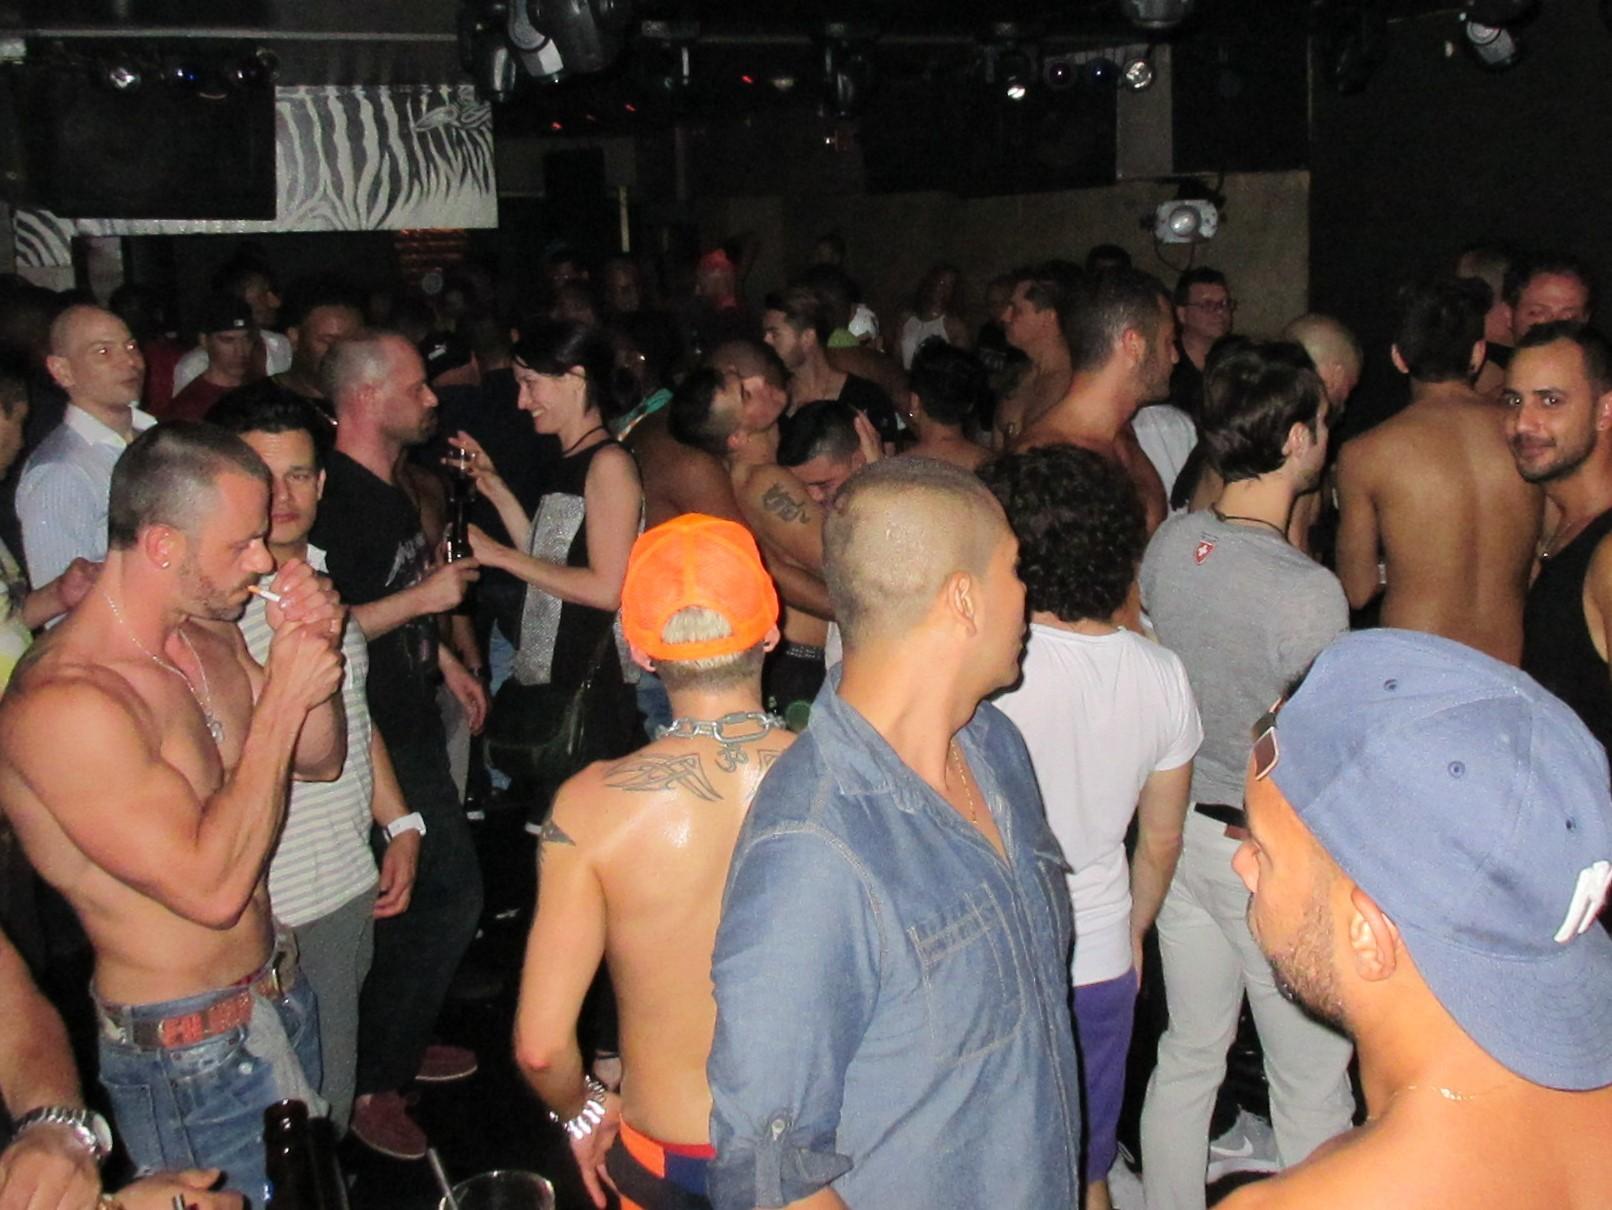 Gay Club In Miami